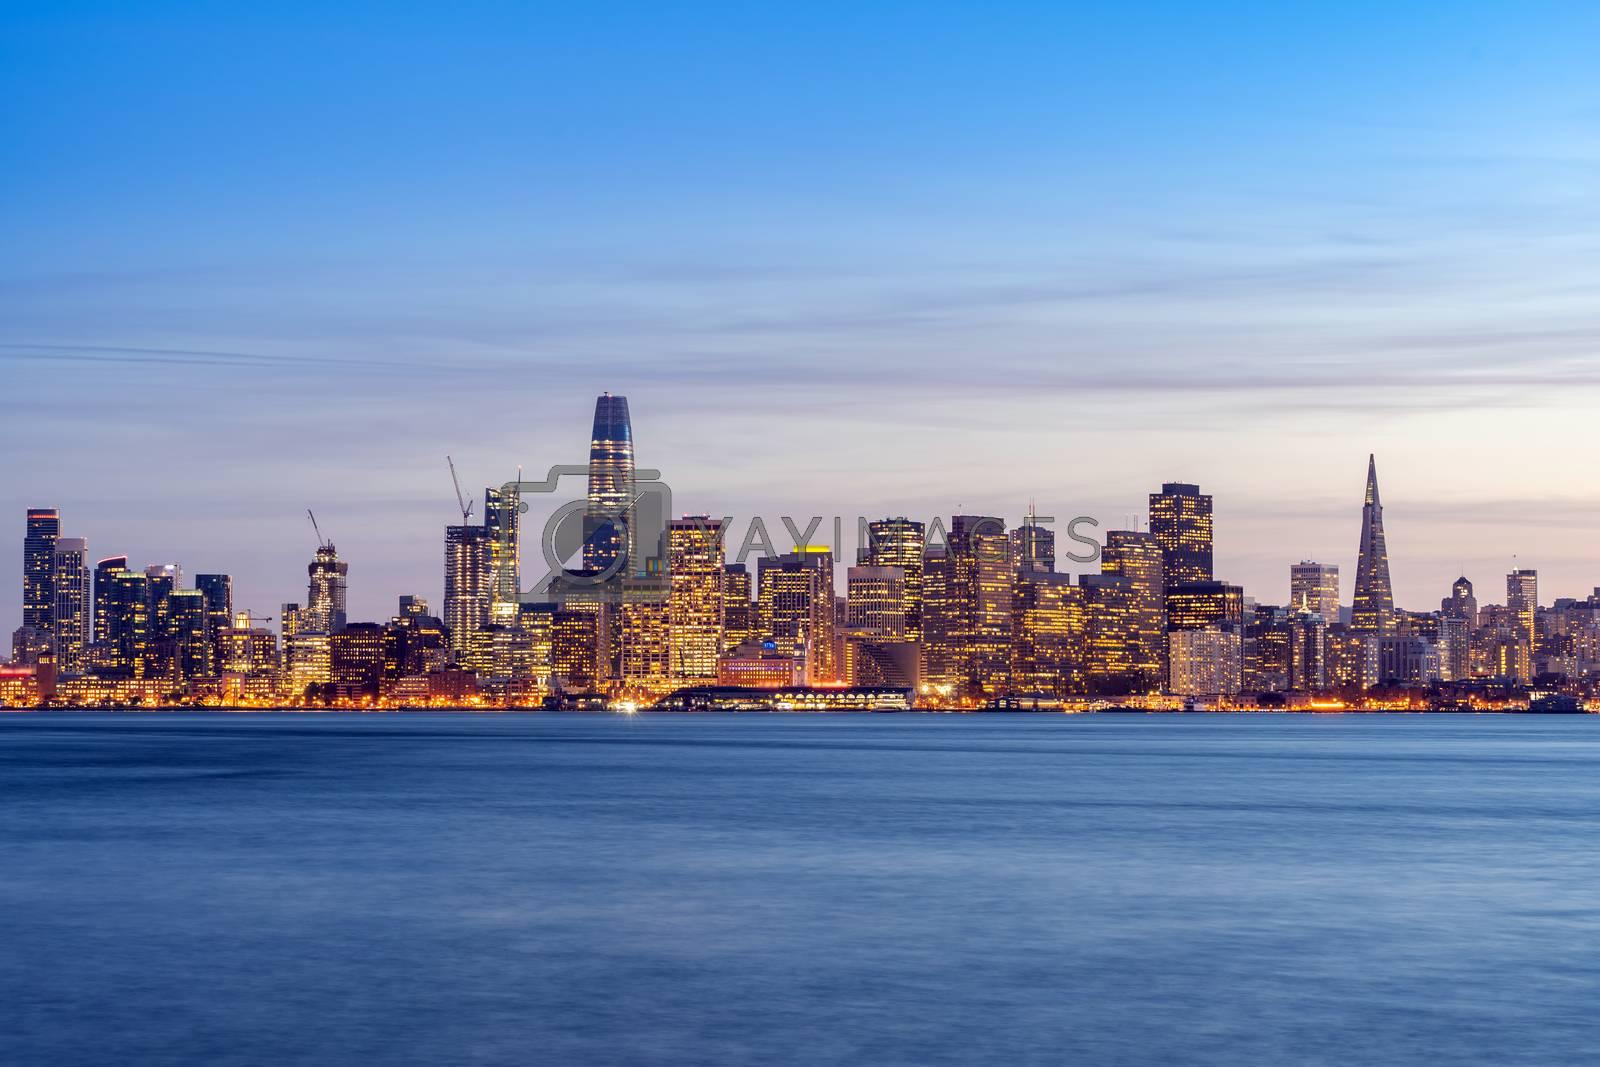 San Francisco downtown skyline at dusk from Treasure Island, California, sunset, USA.